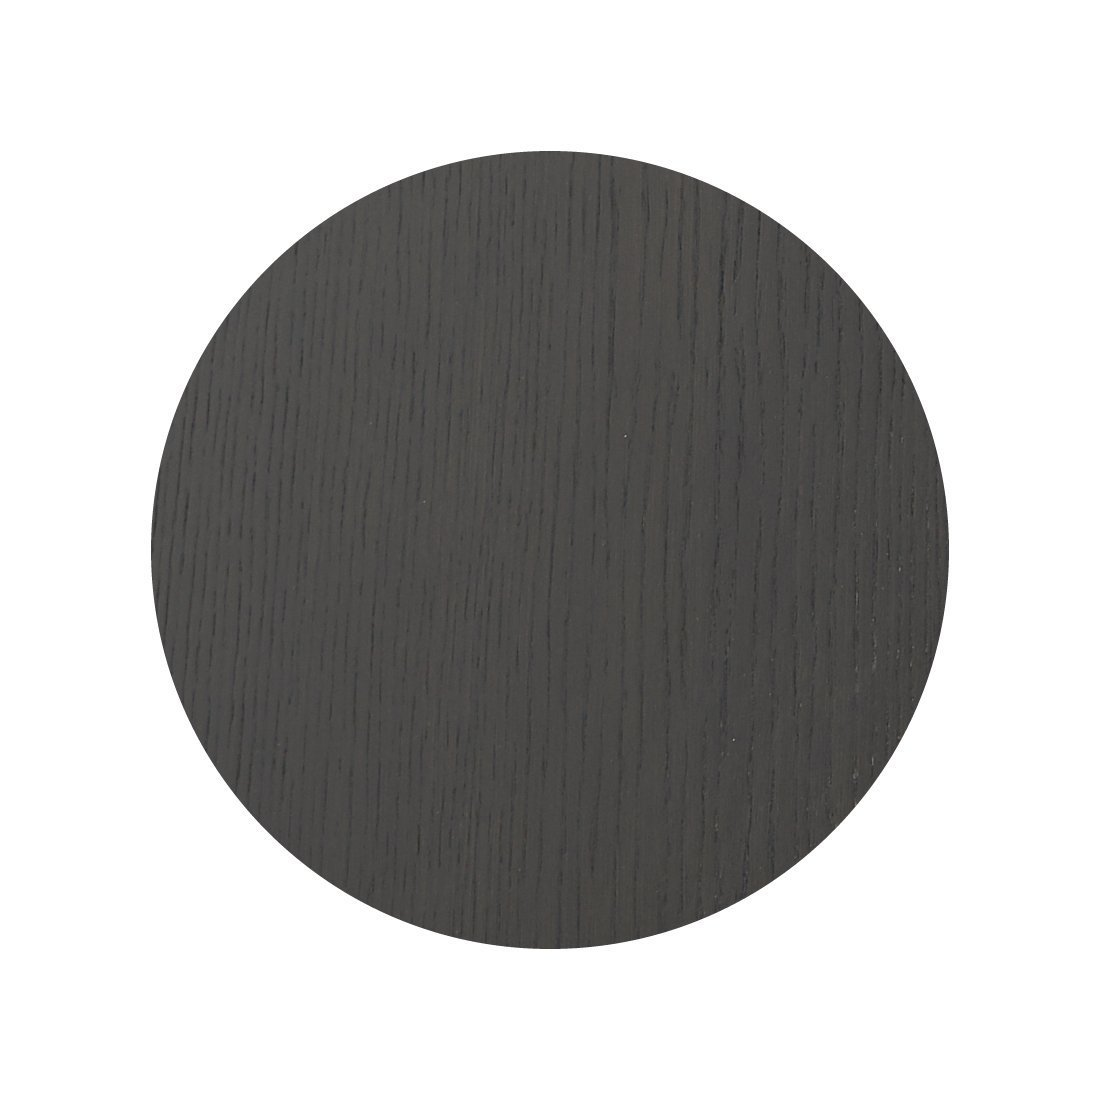 Spectrum Phill Eettafel 240 x 90 cm Antraciet